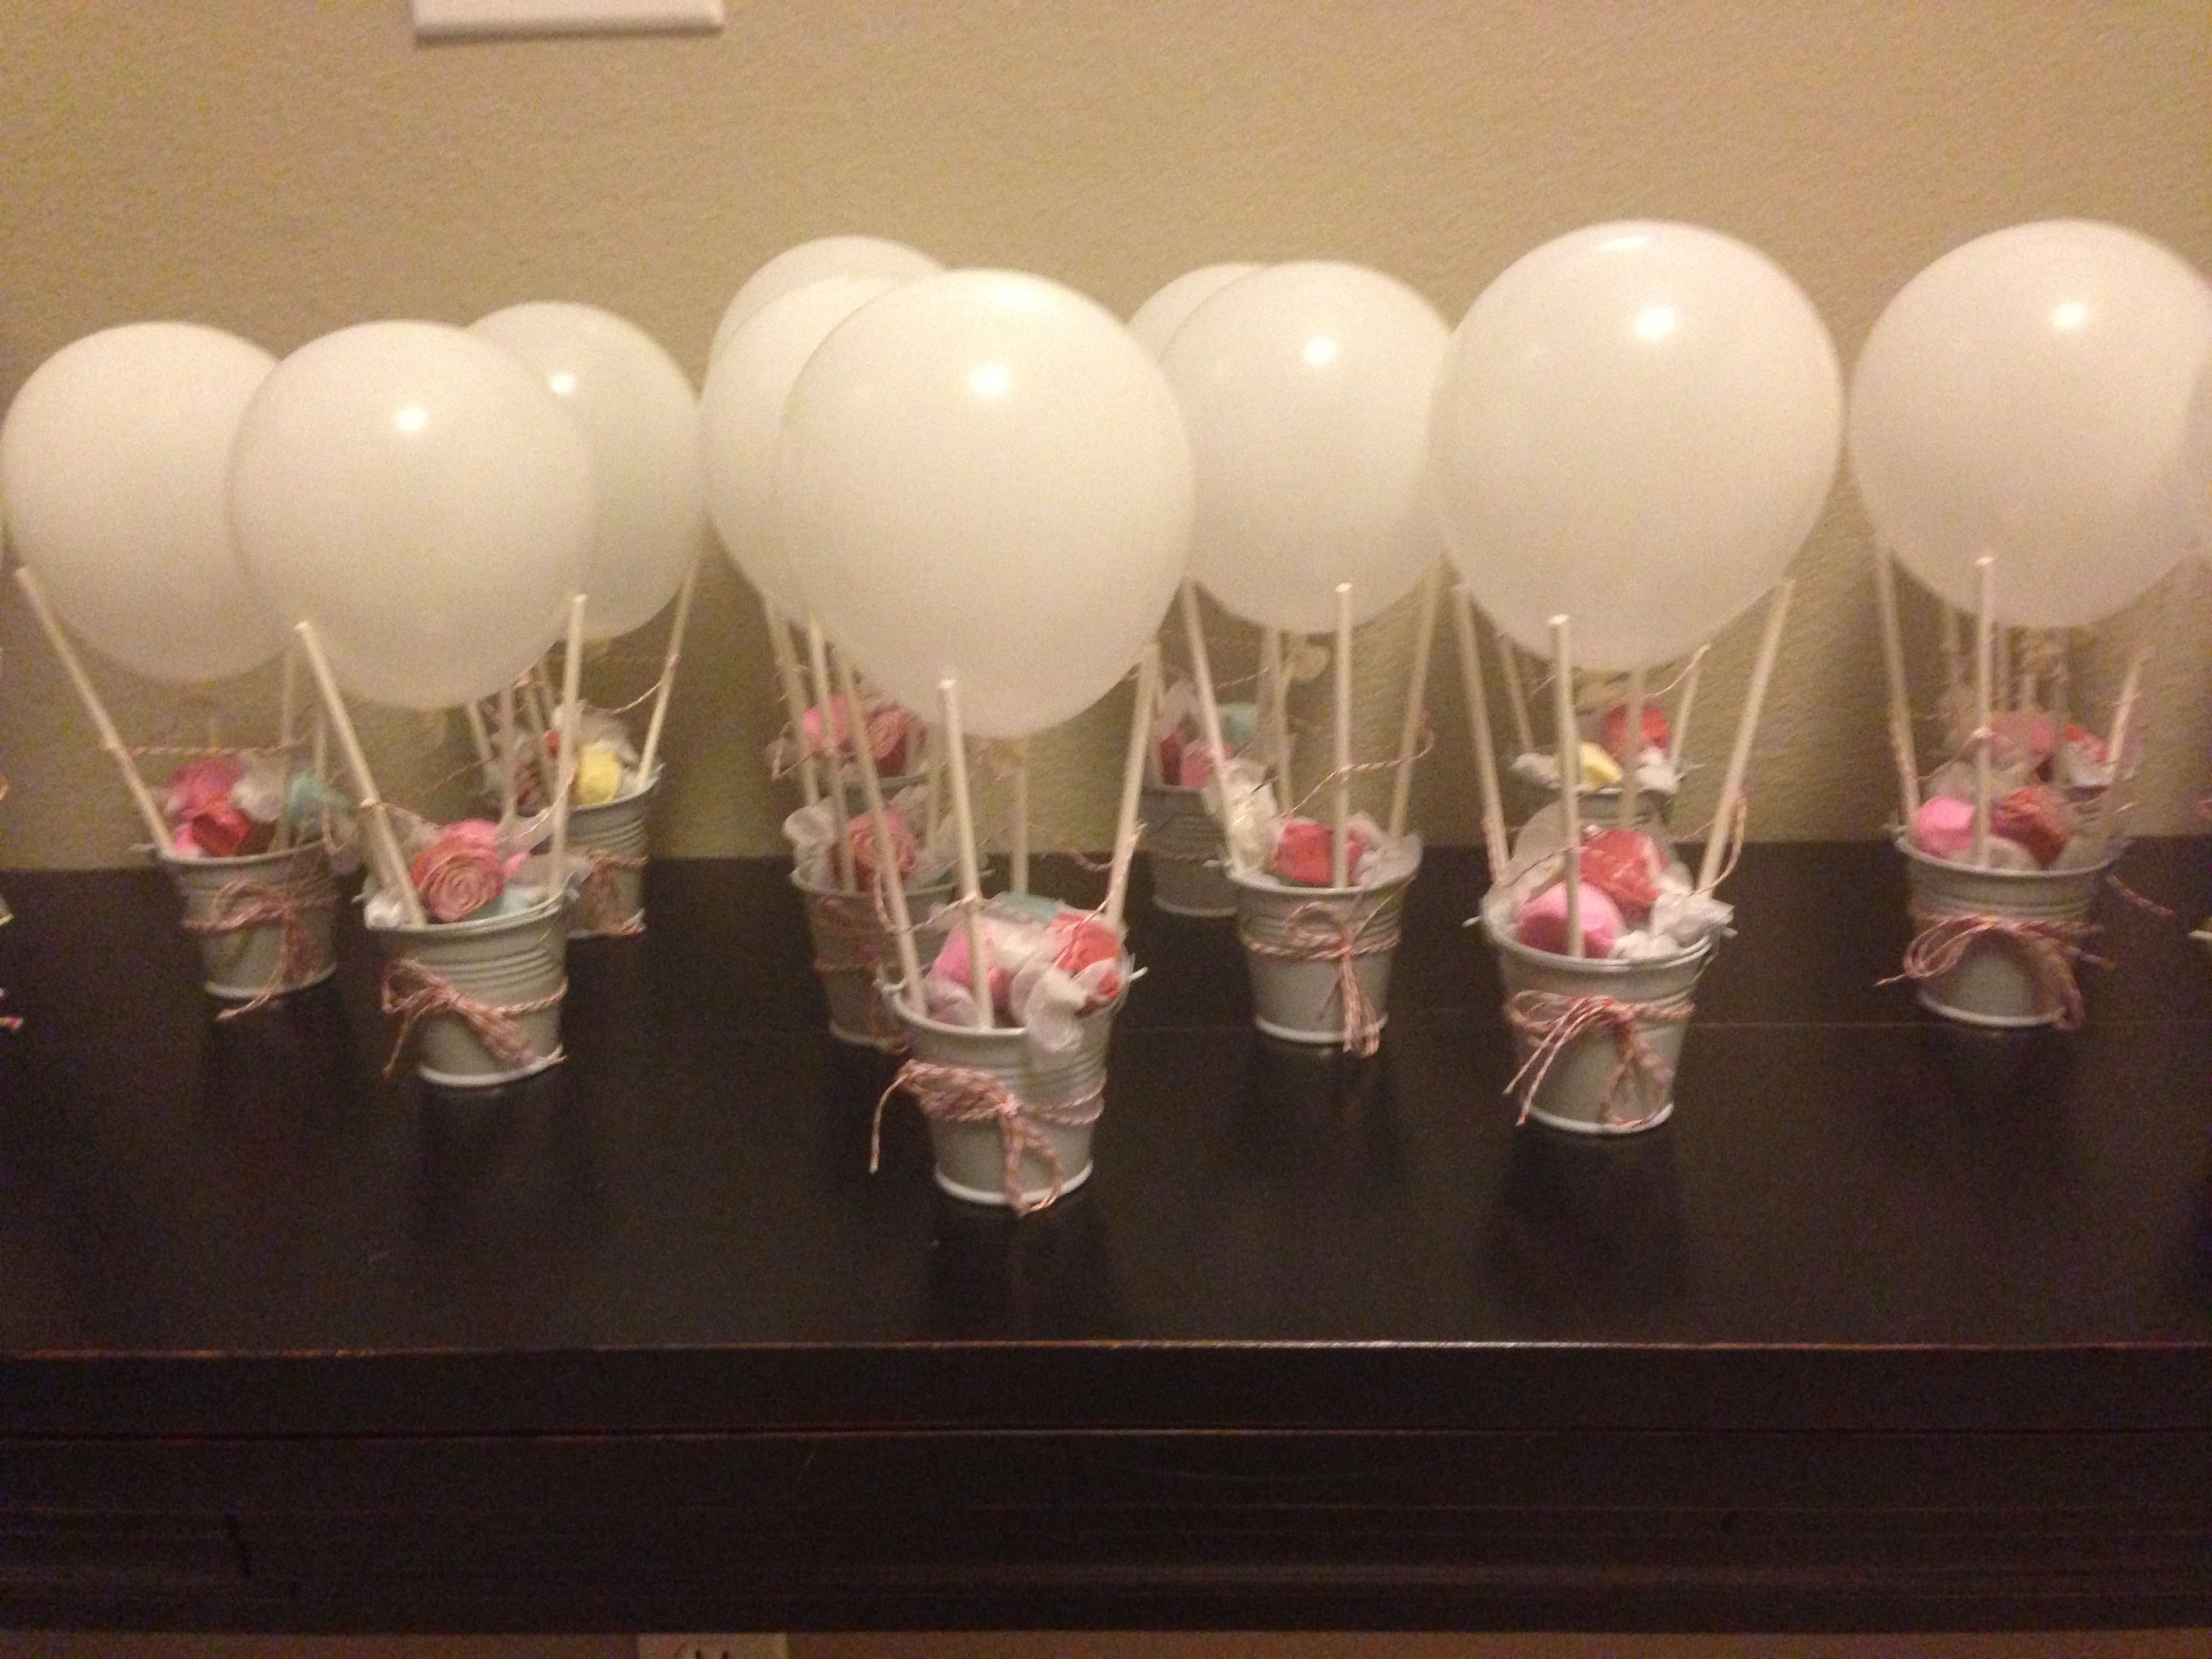 Image Result For Balloon Candy Cups Decor Heissluftballon Party Luftballons Geschenke Verpacken Geburtstag Kinder